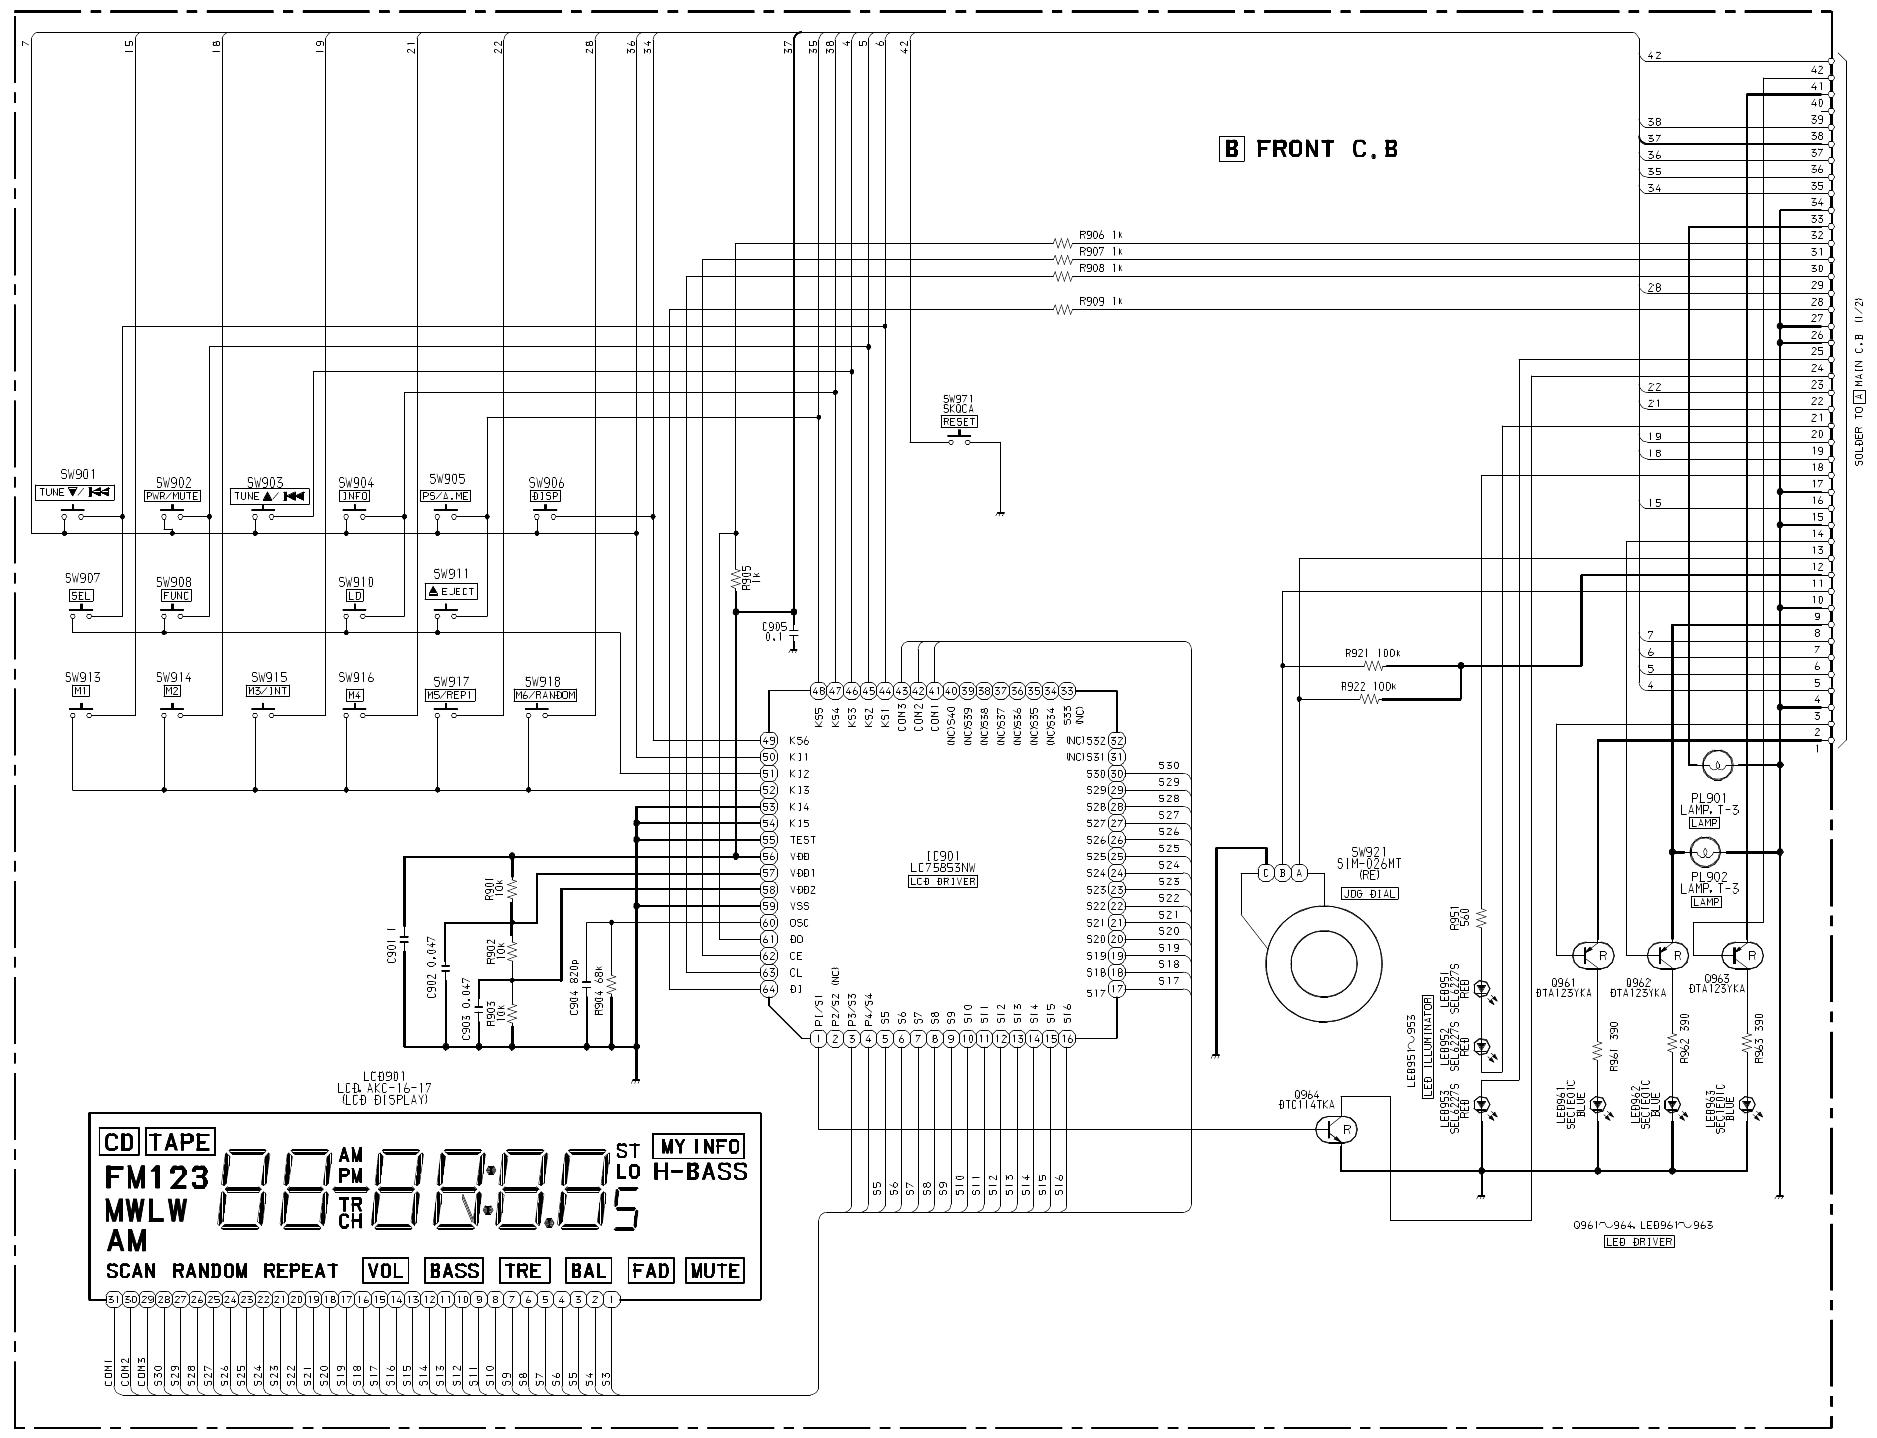 Aiwa Cdc Z107 Users Manual Akchr1a4 Block Diagram Ks1 Schematic 3 Front